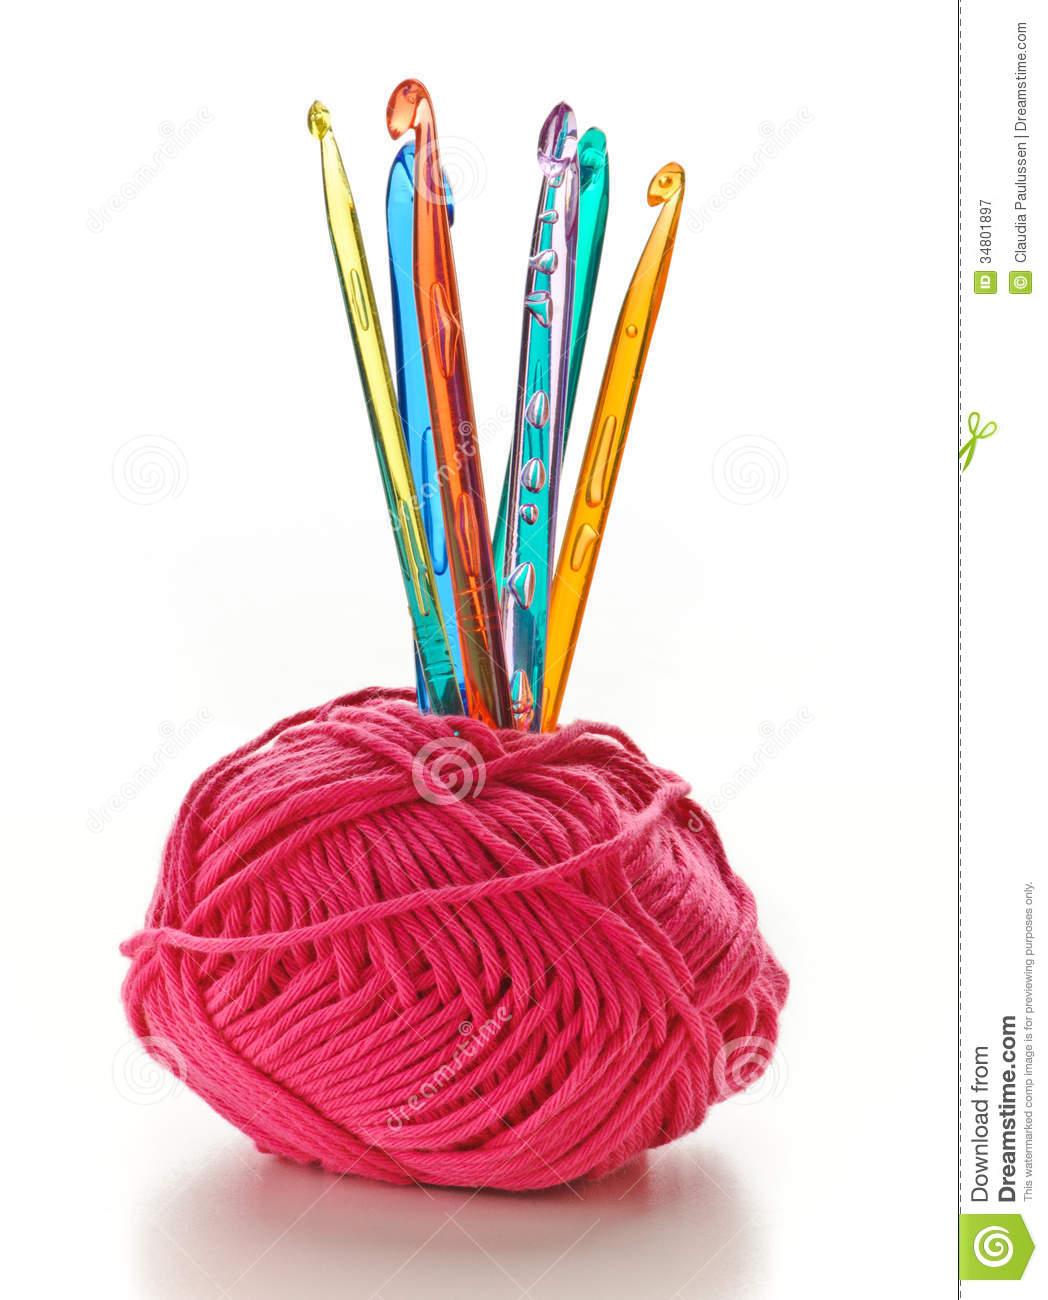 Crochet Needle Clipart Free Download Best Crochet Needle Clipart